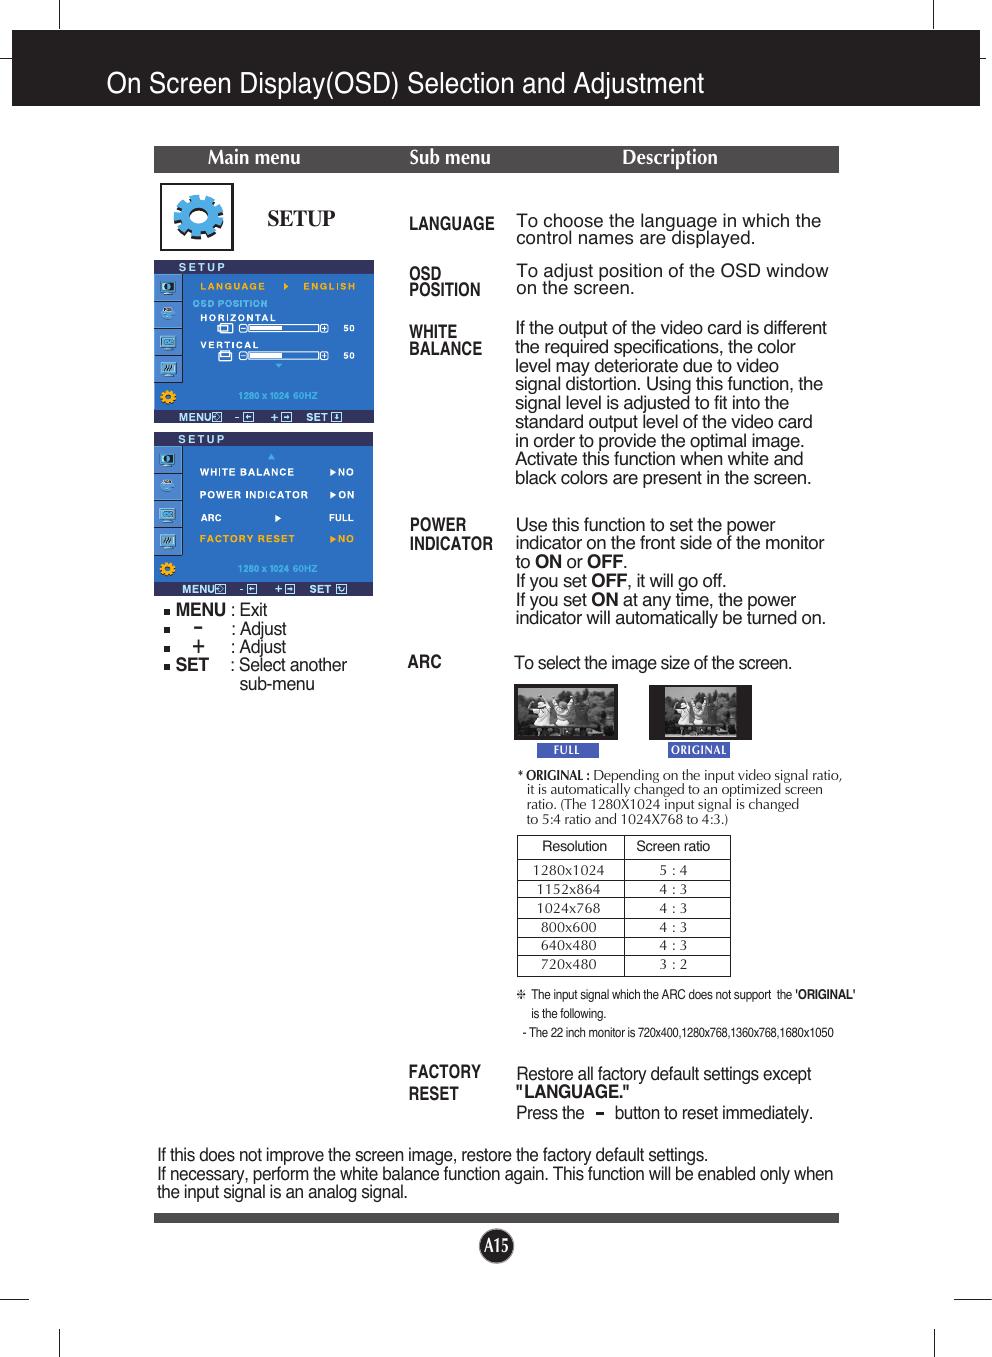 Lg L225Ws Sf Owner S Manual IP0753_L226WT_Eng_05_1022_OK